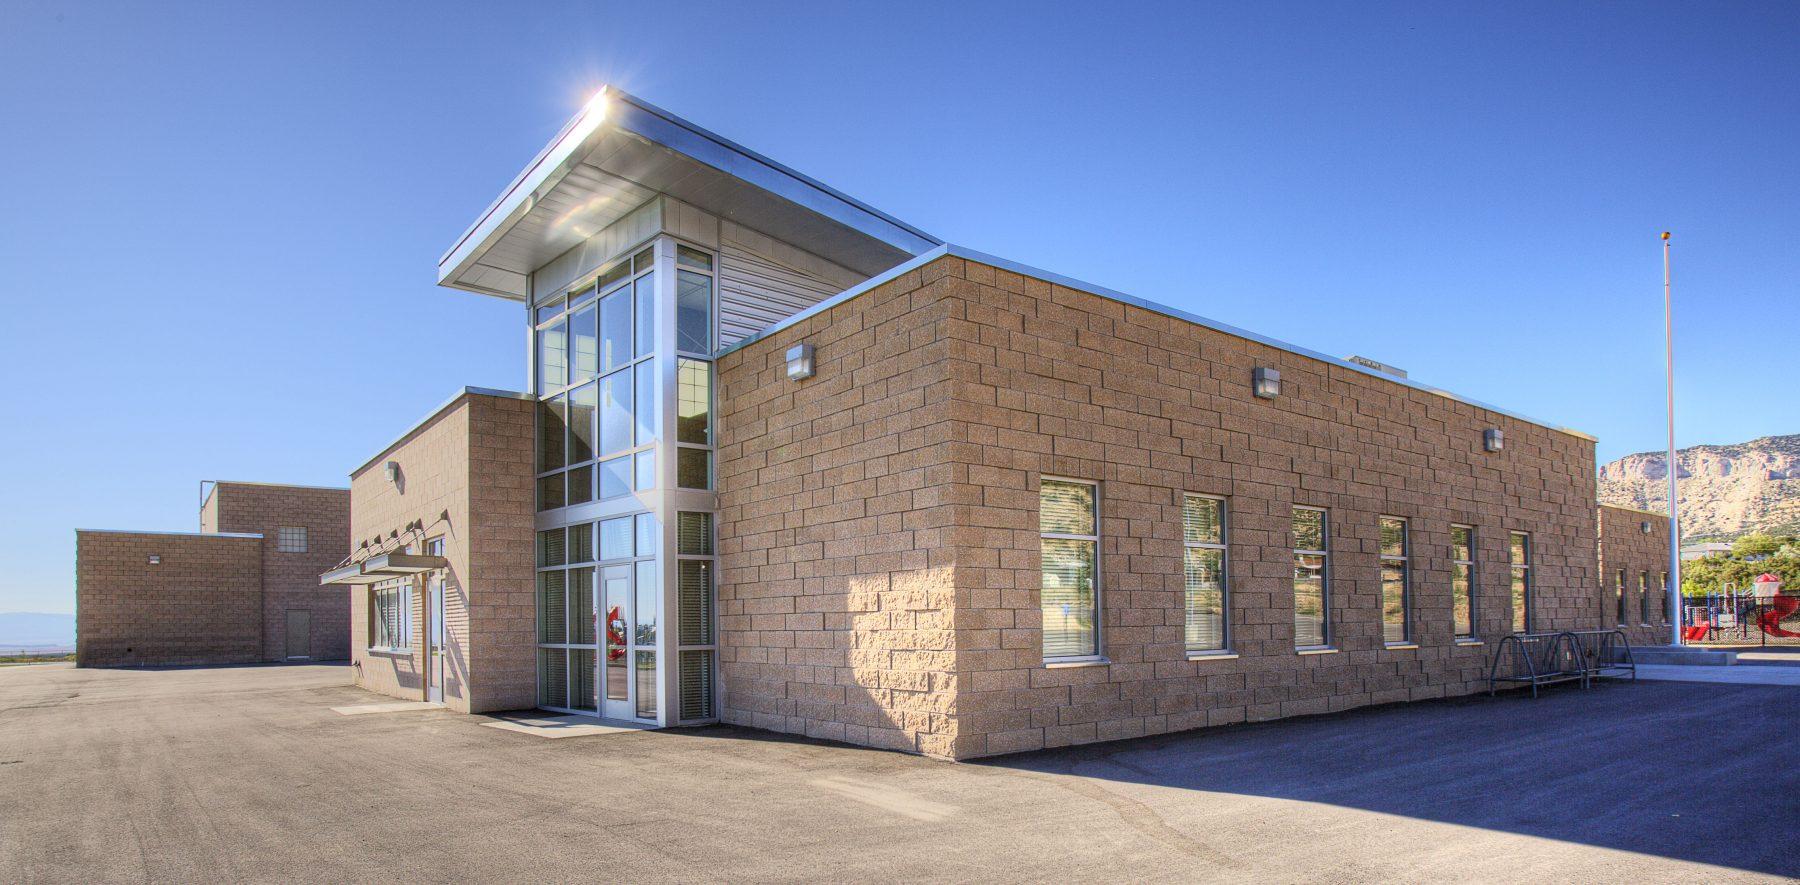 Bruin Point Elementary School